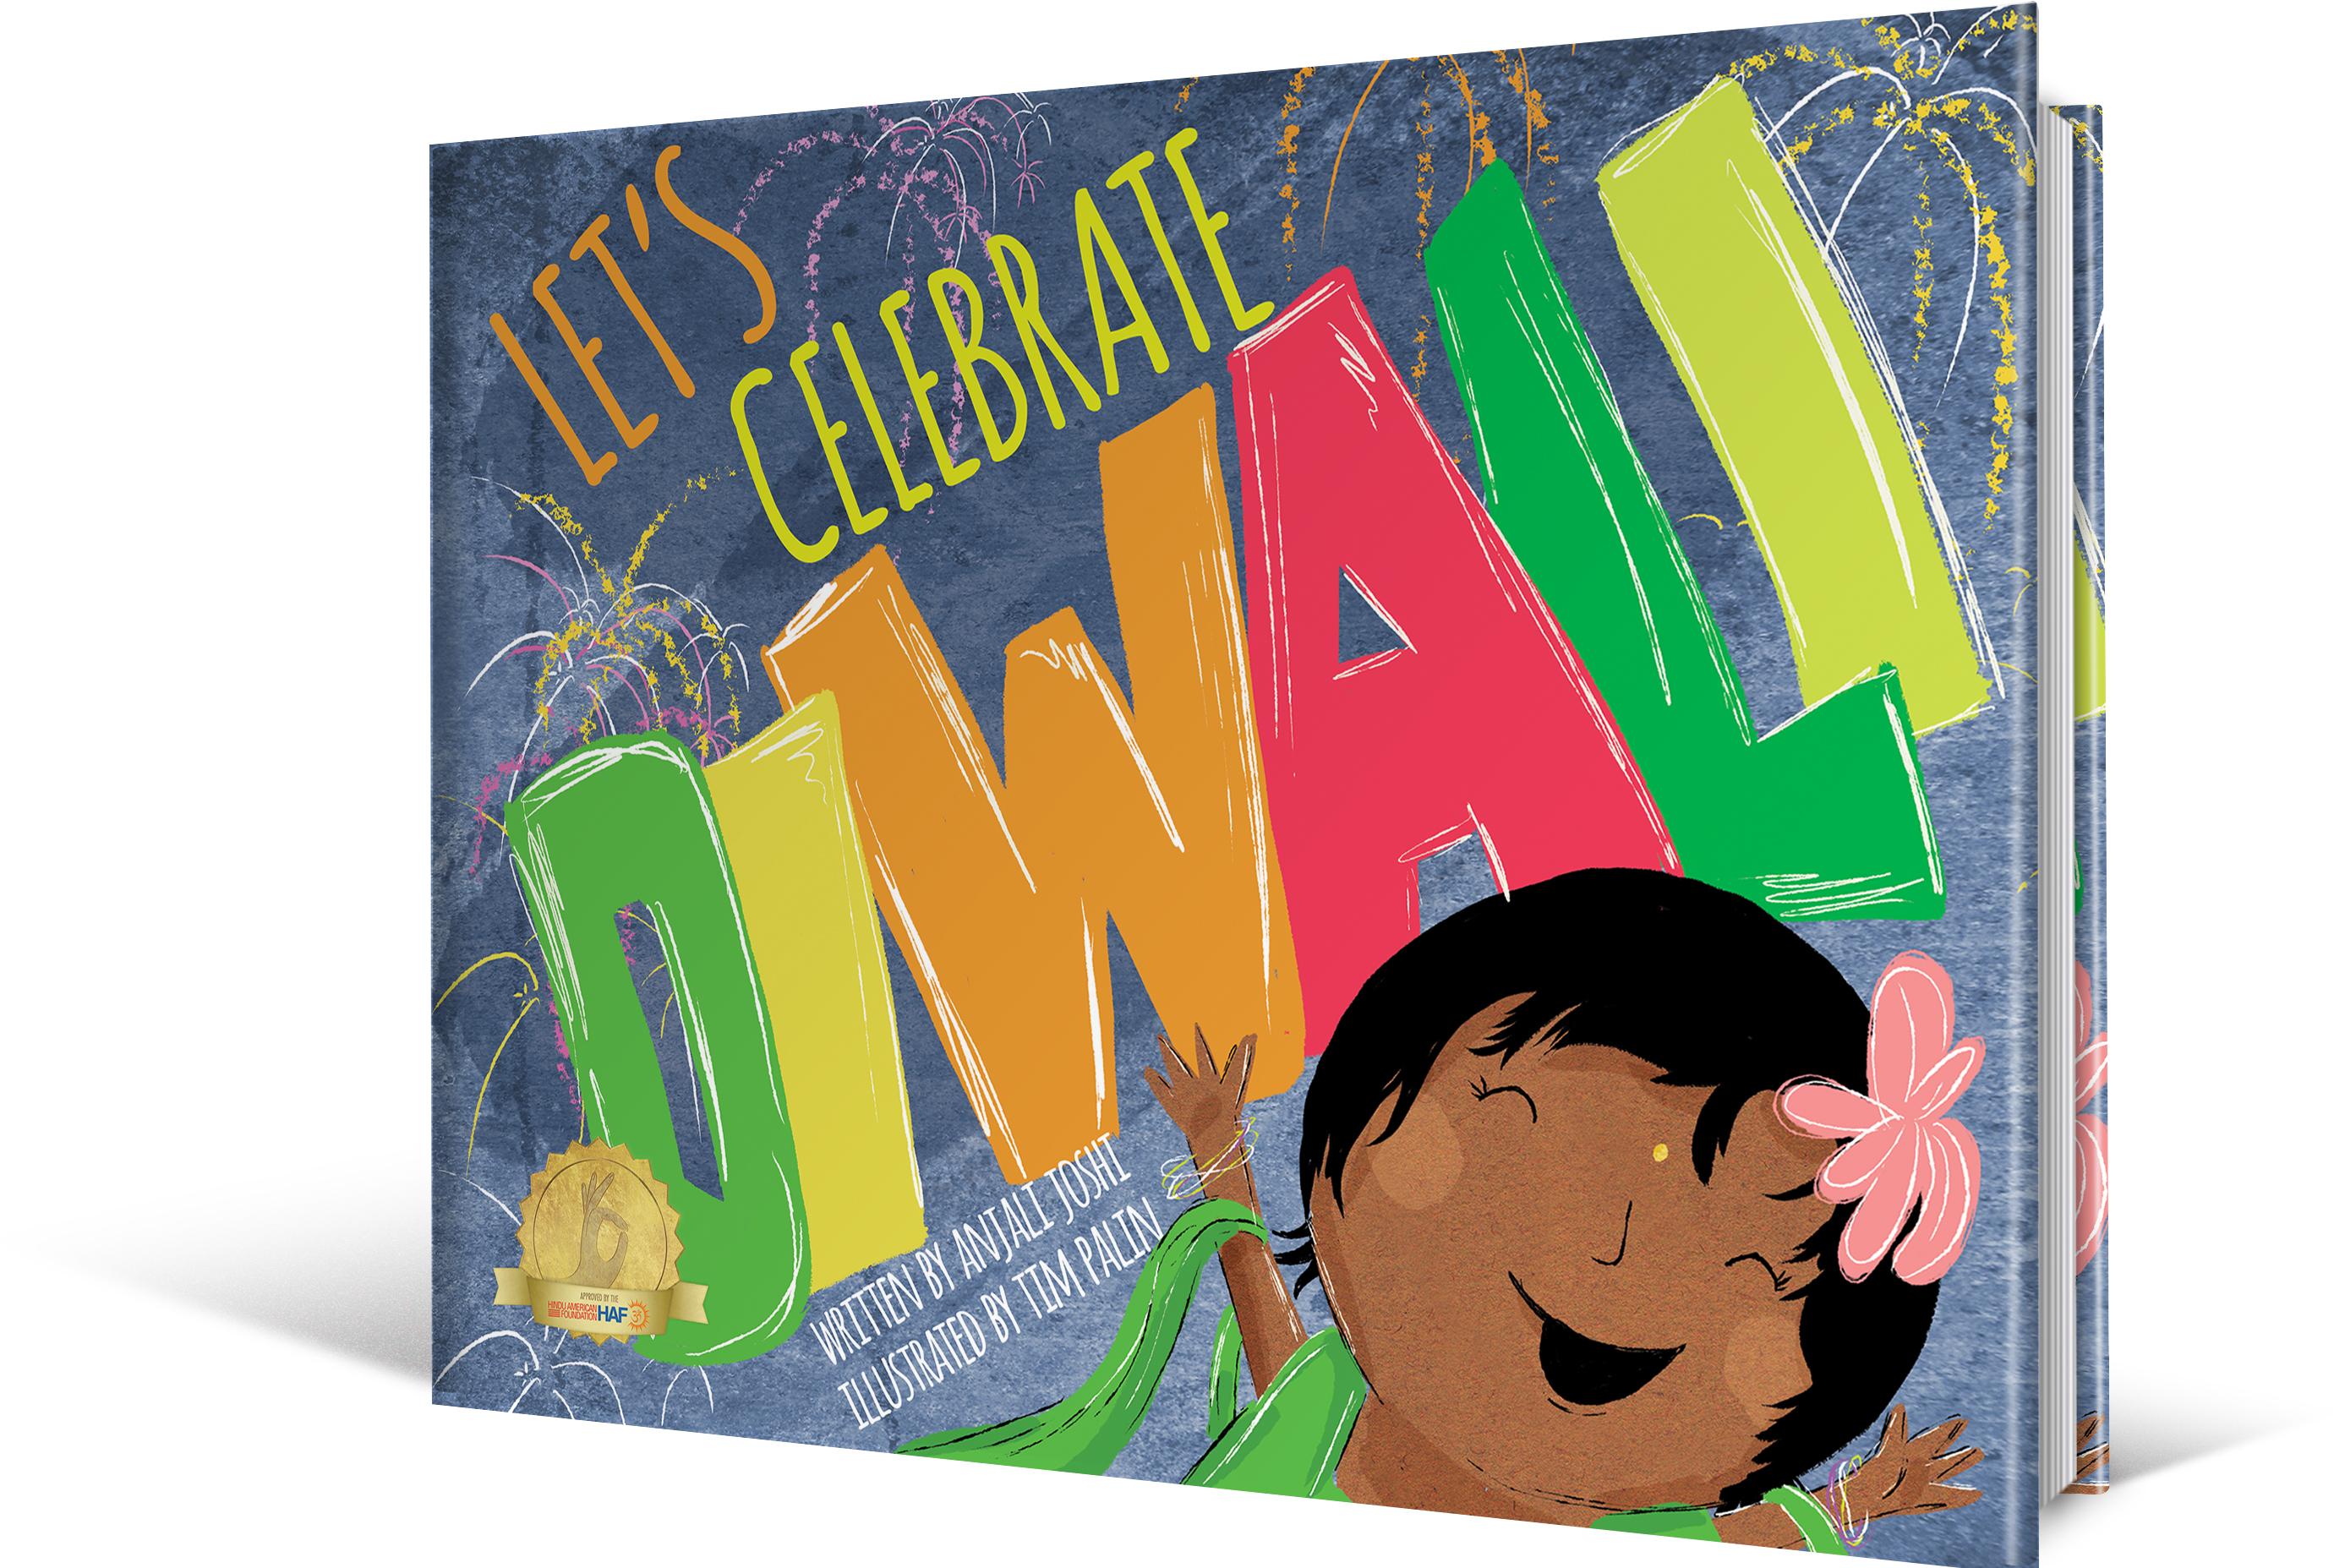 Children's Book, Let's Celebrate Diwali, Explores Unifying Theme of Friendship Through Culture